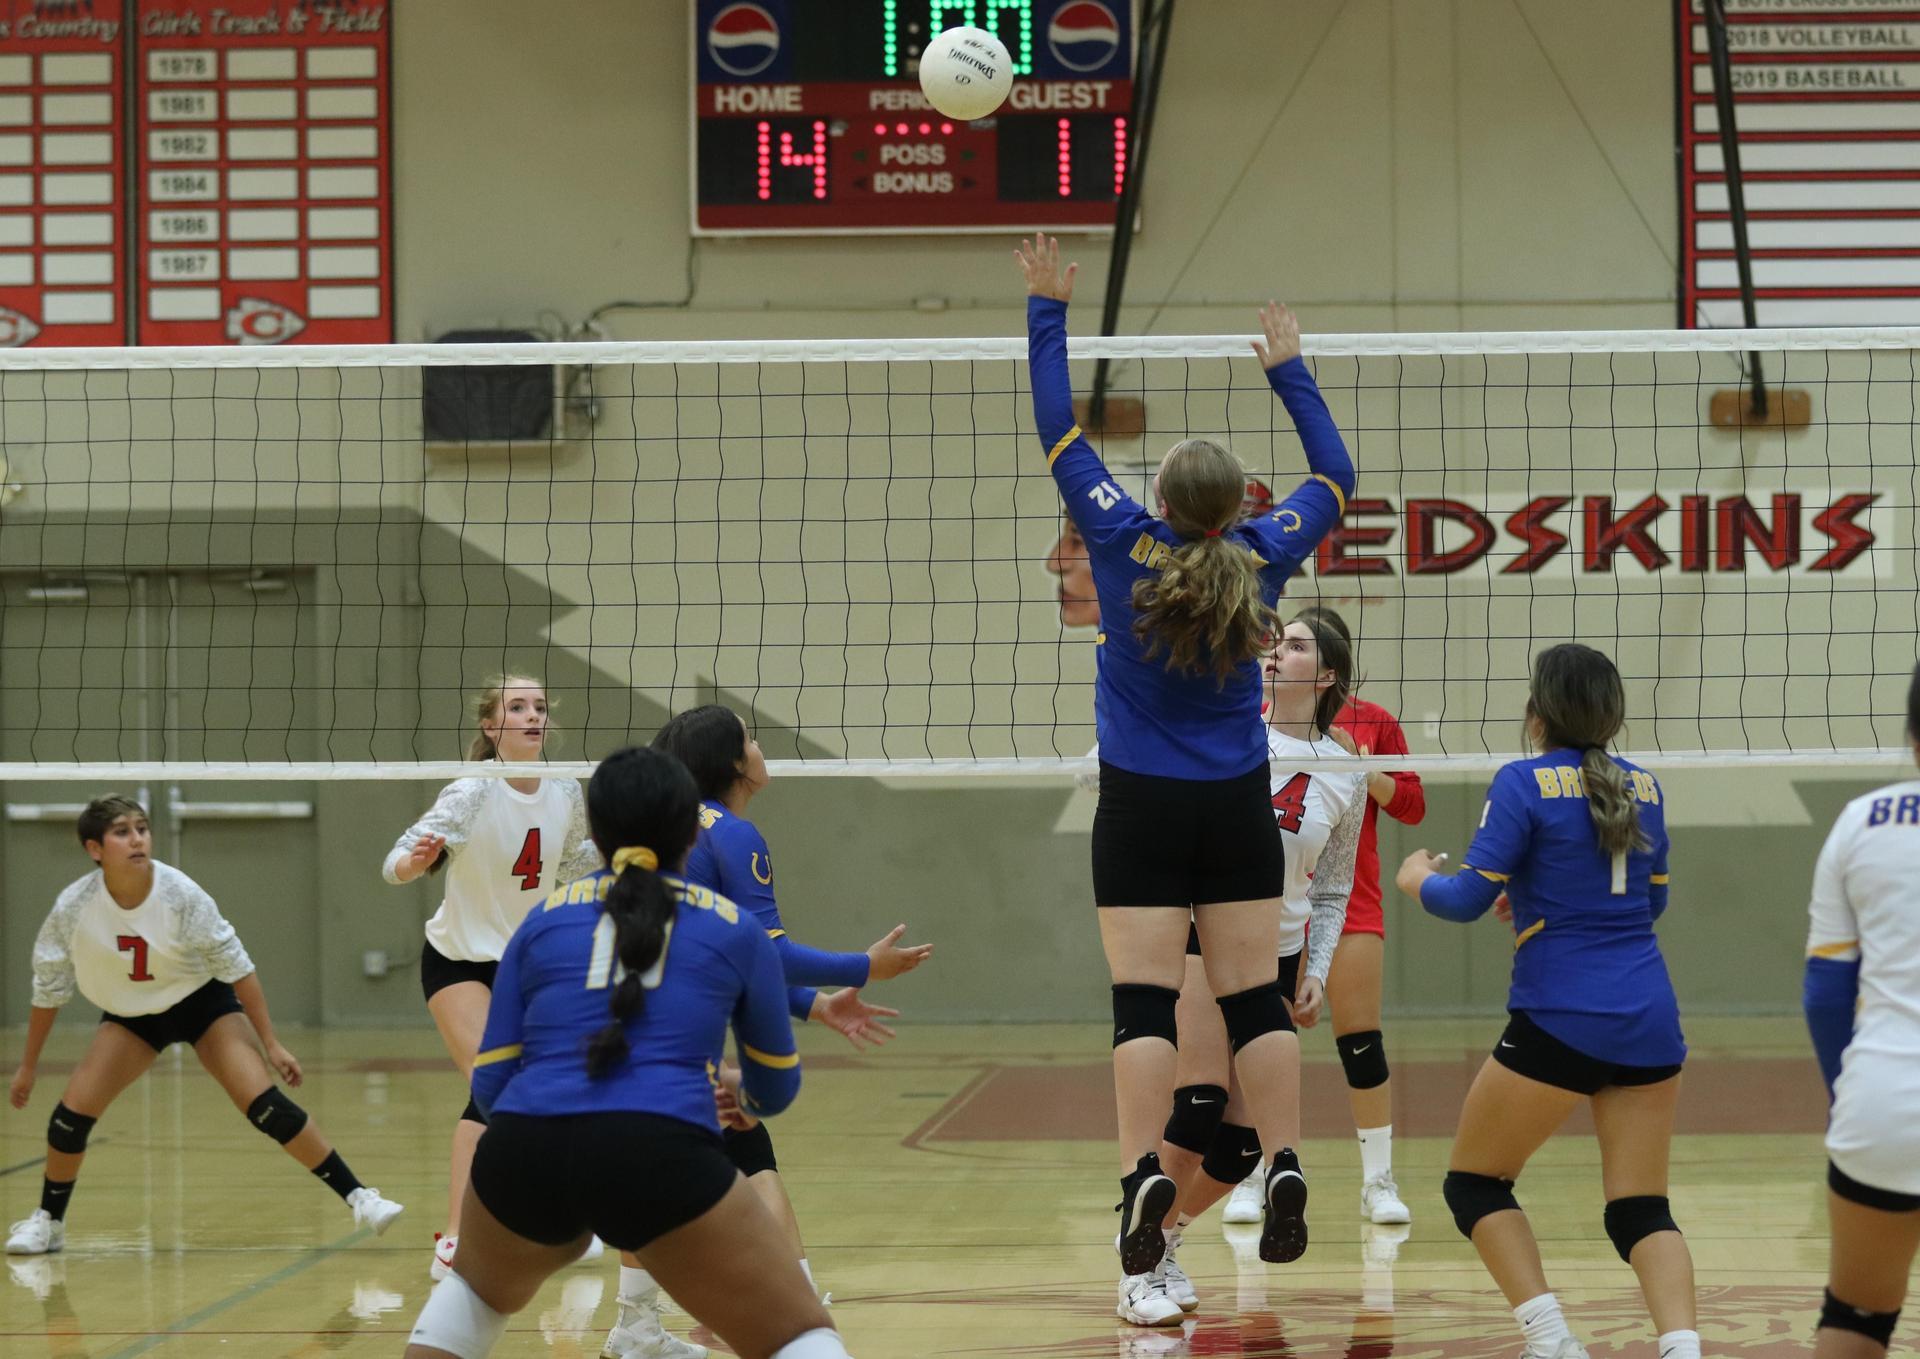 JV girls playing volleyball against Firebaugh